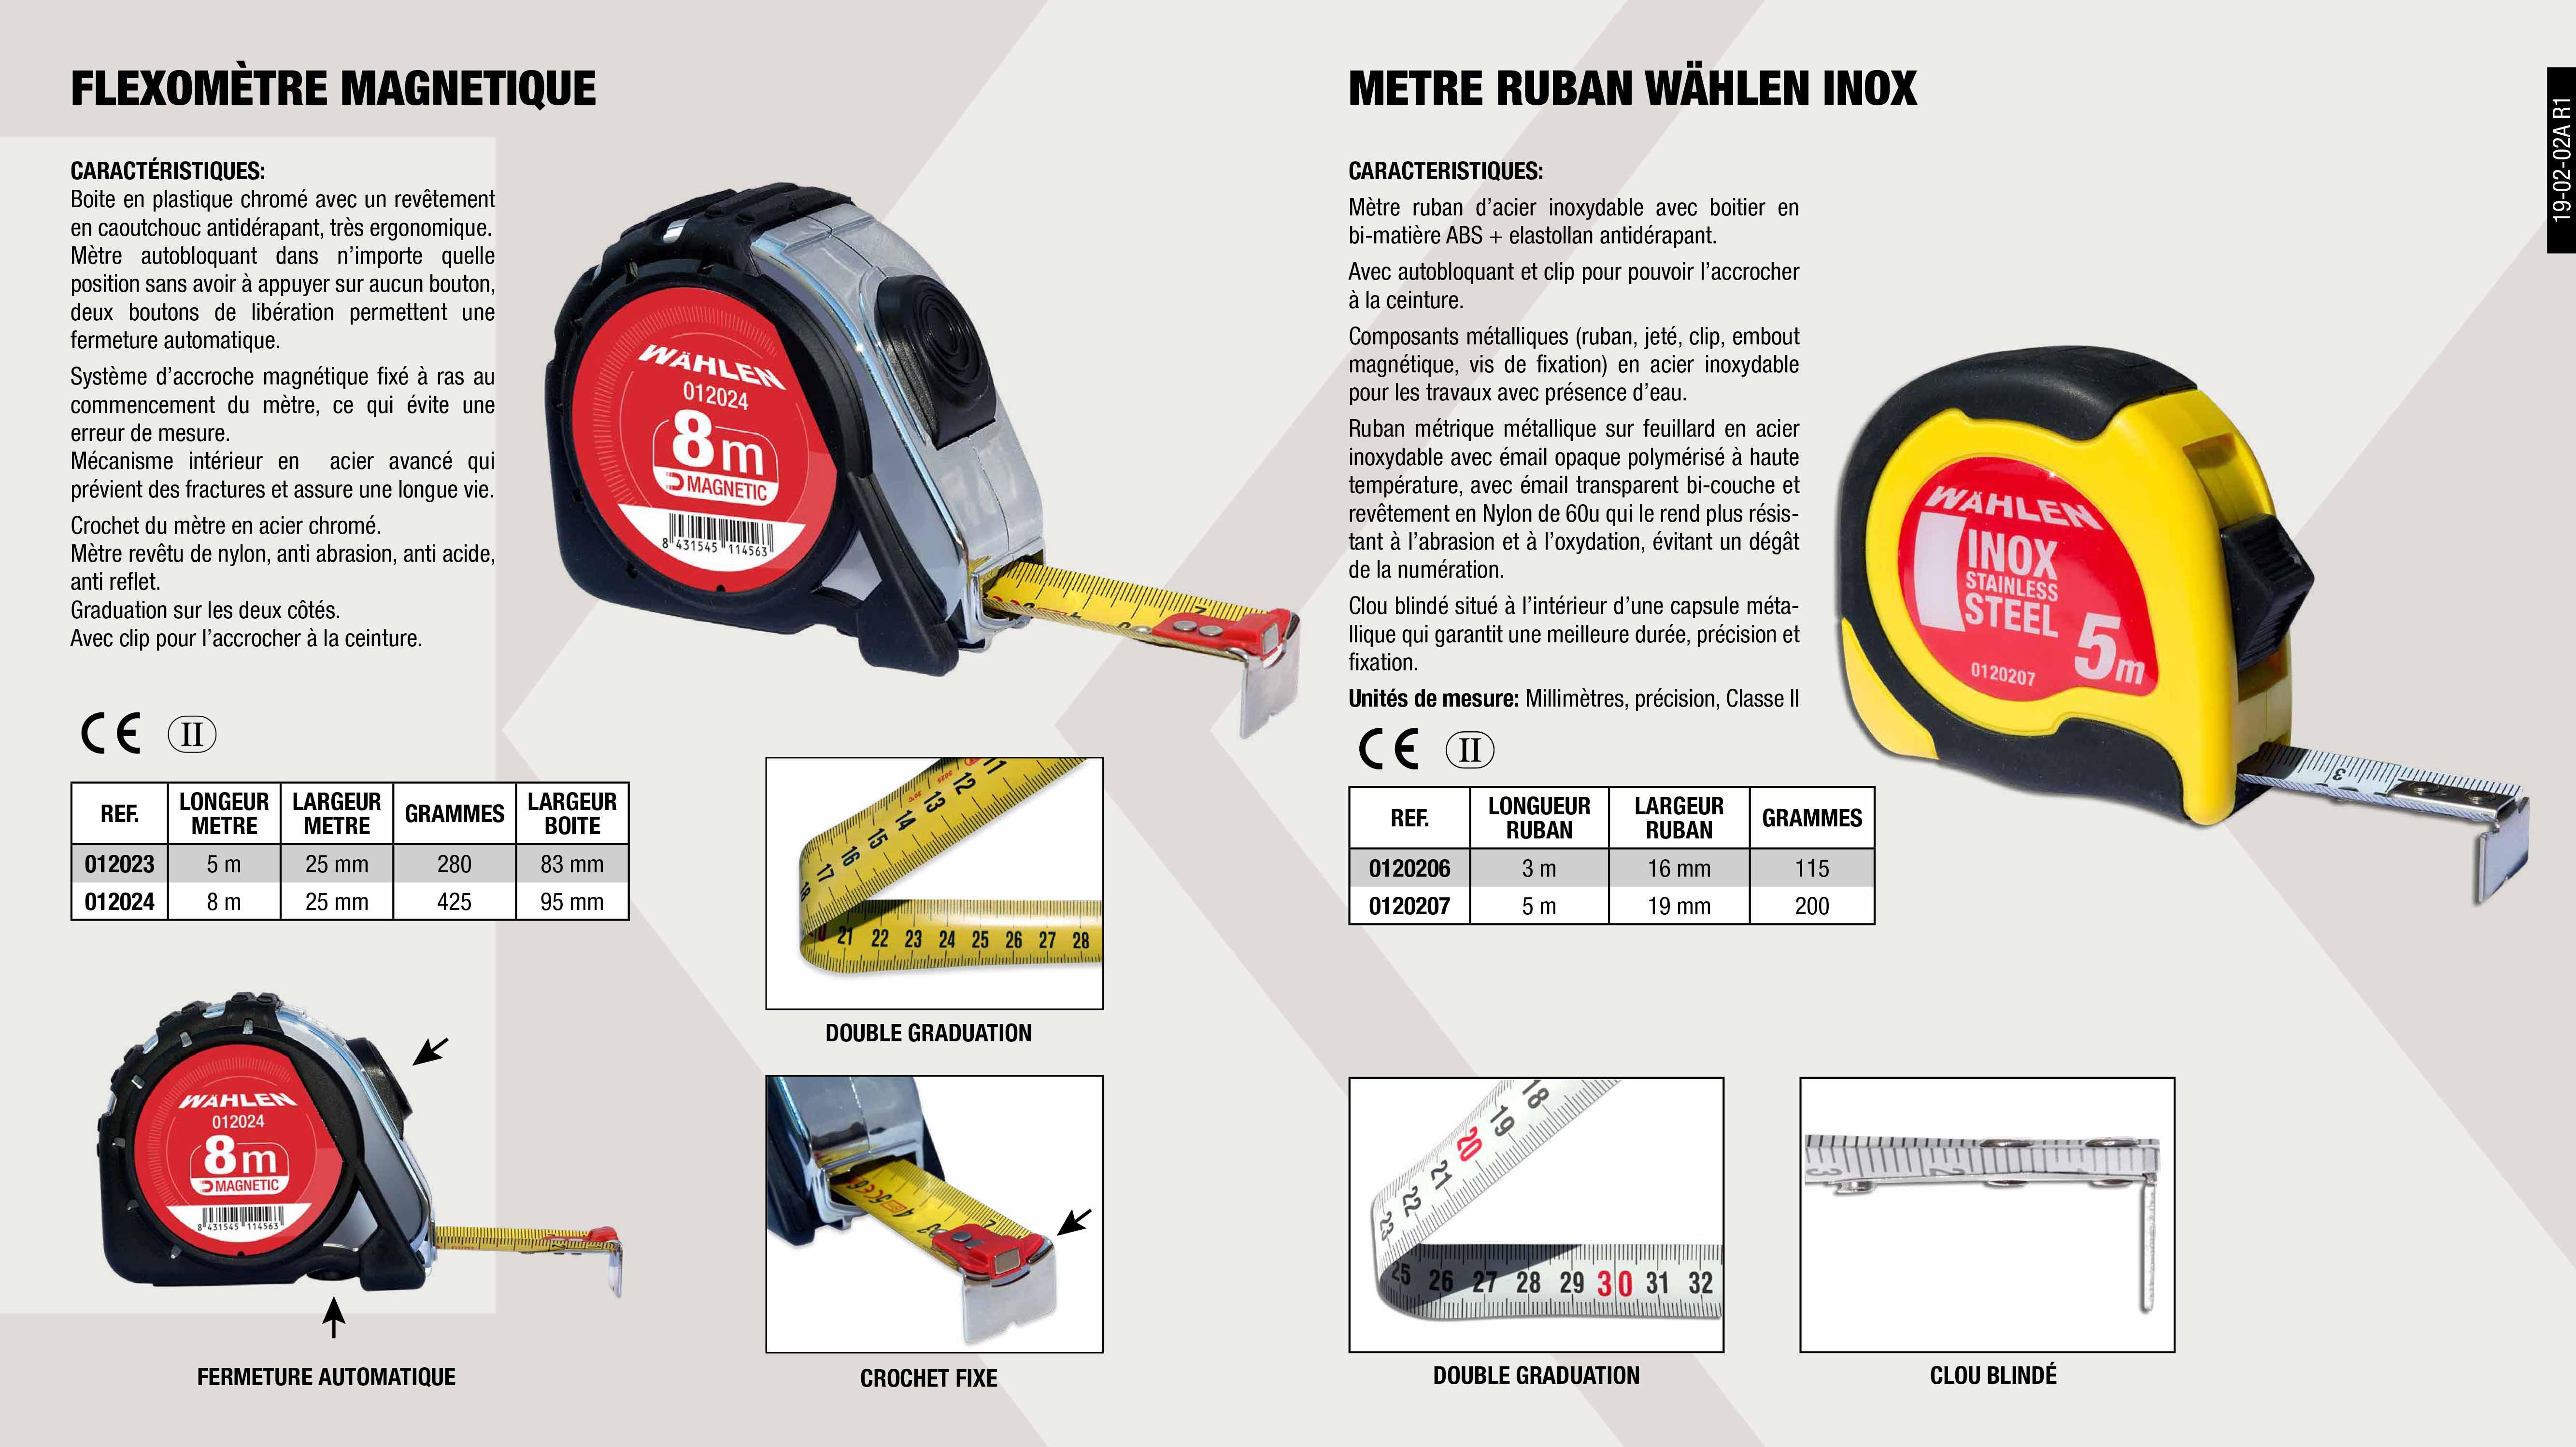 METRE RUBAN WAHLEN INOX 5M                                  ,  FLEXOMETRE MAGNETIQUE 5 METRES                              ,  FLEXOMETRE MAGNETIQUE 8 METRES                              ,  METRE RUBAN WAHLEN INOX 3M                                  ,